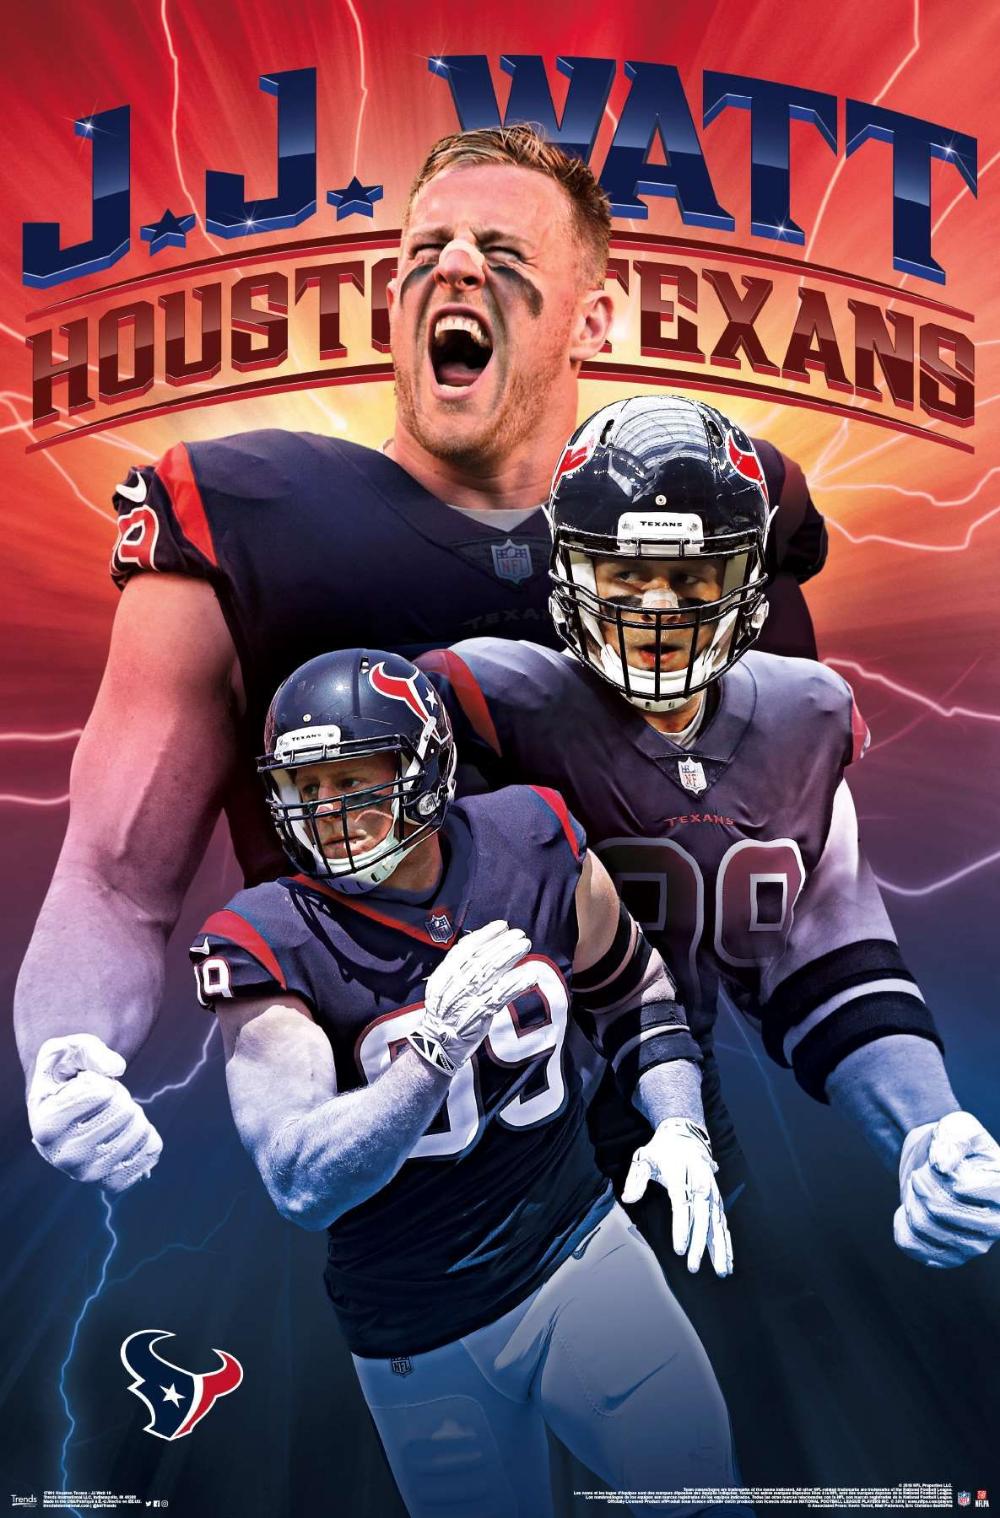 Houston Texans Jj Watt Houstontexans Nflfootball Nfl Footballposter Footballpartydecorations Trendsposters Nfl Houston Texans Houston Texans Texans